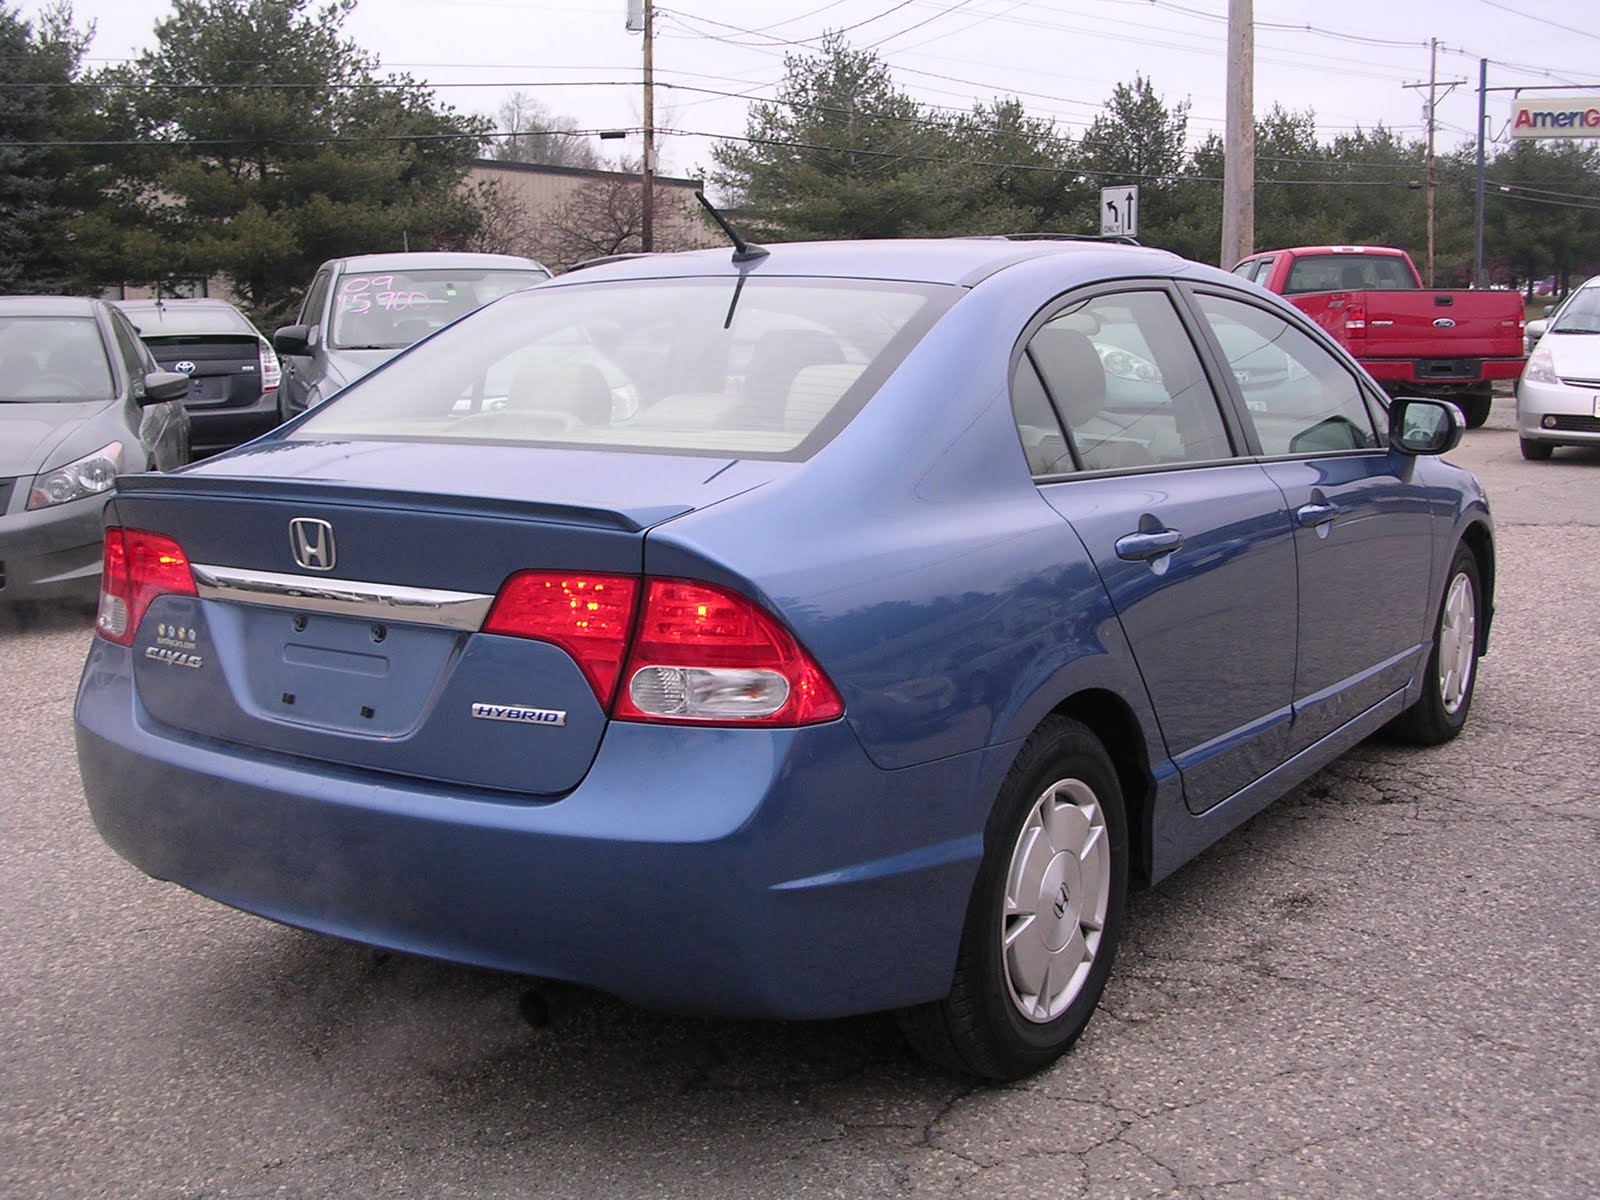 Lovely EARTHY CAR OF THE WEEK: 2009 Blue Honda Civic Hybrid